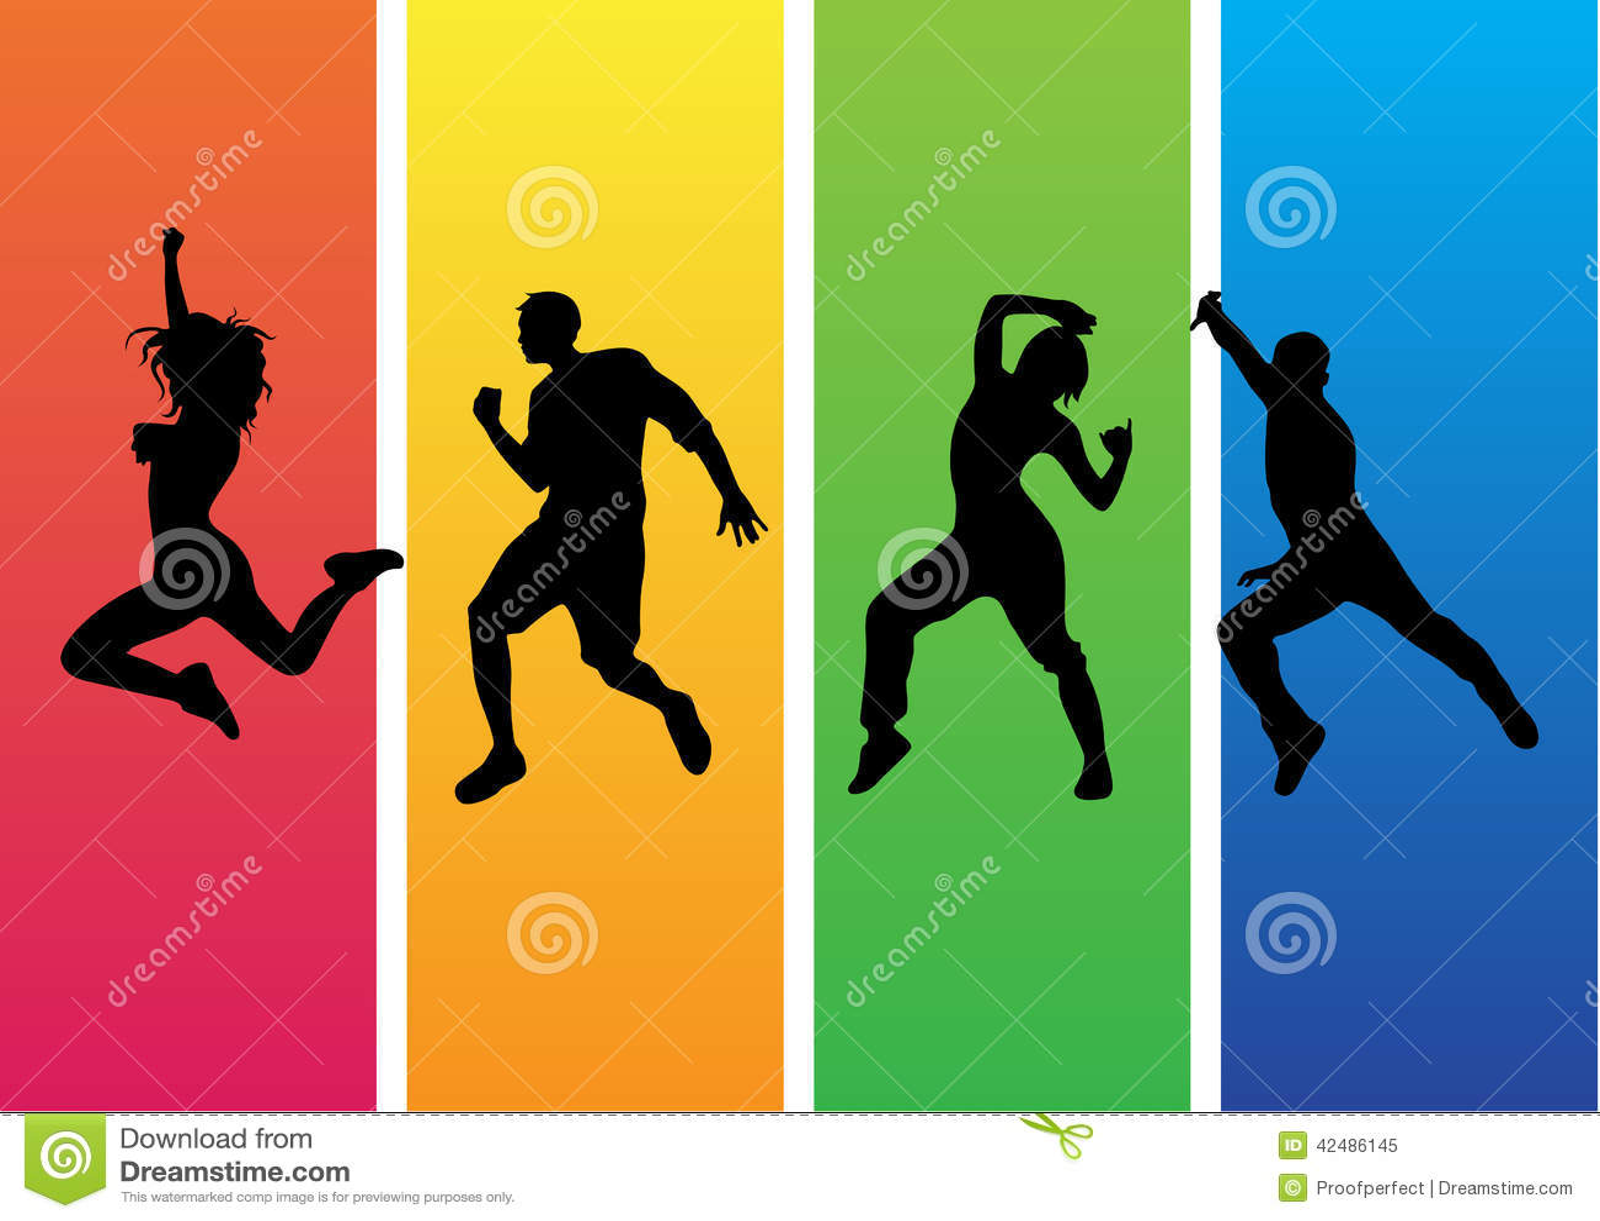 Zumba Dance Silhouette Vector Stock Vector Image 42486145